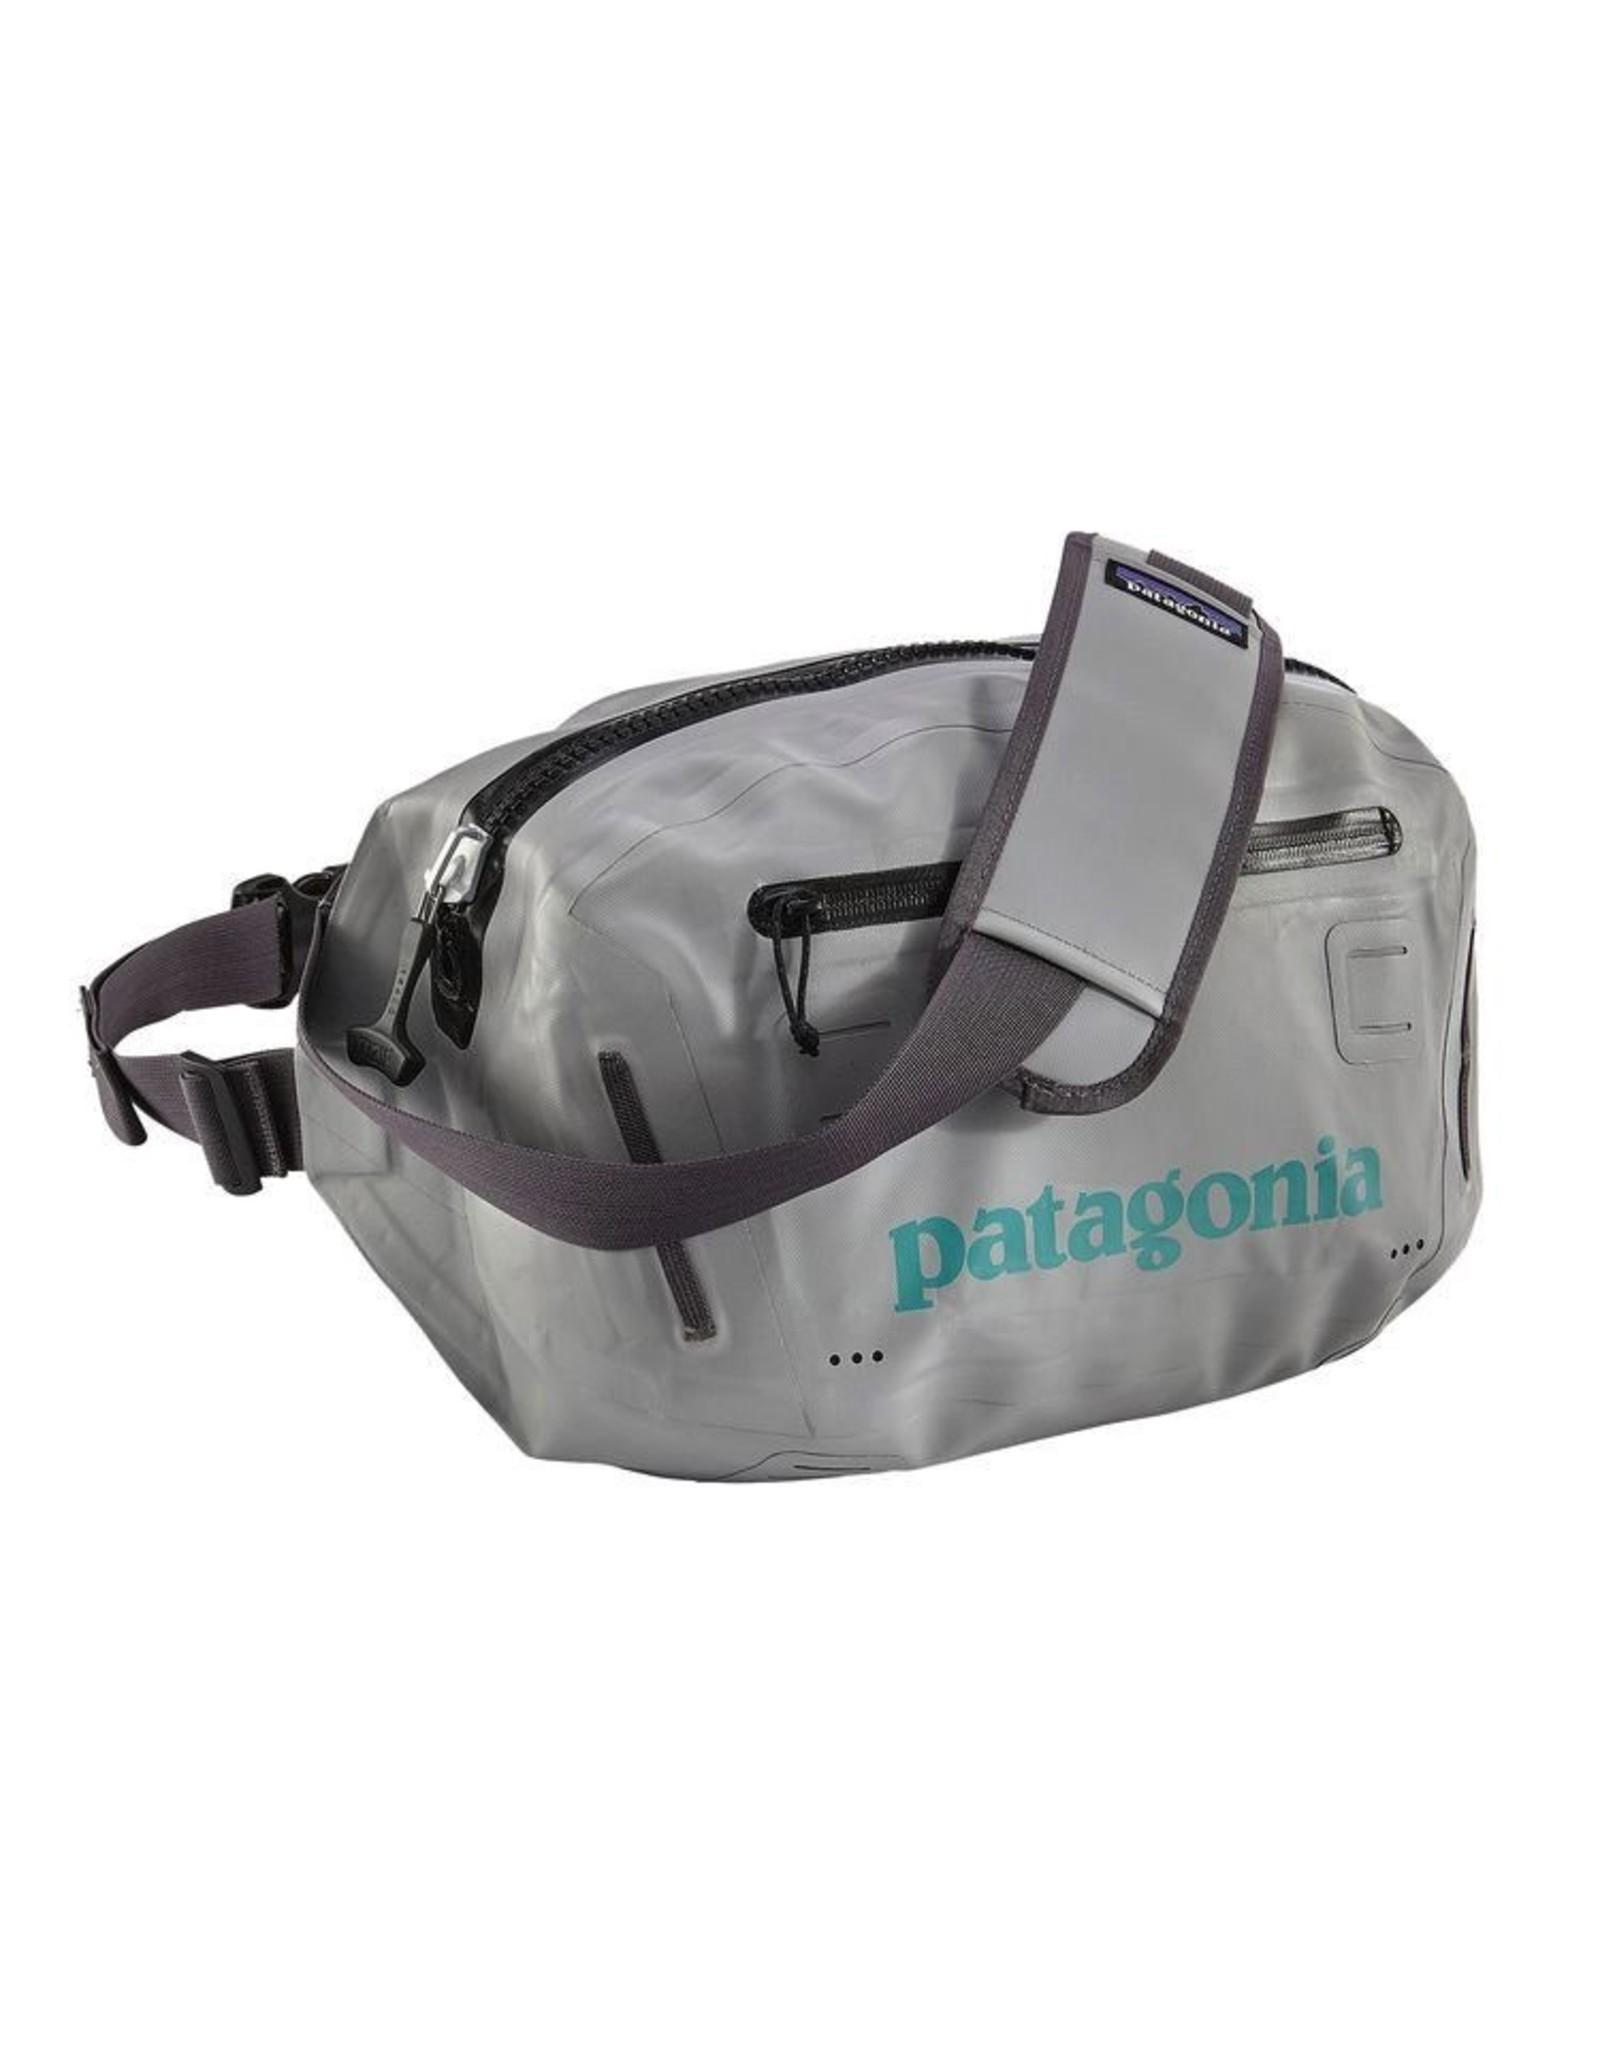 Patagonia Patagonia Stormfront Hip Pack 10 L Drifter Grey